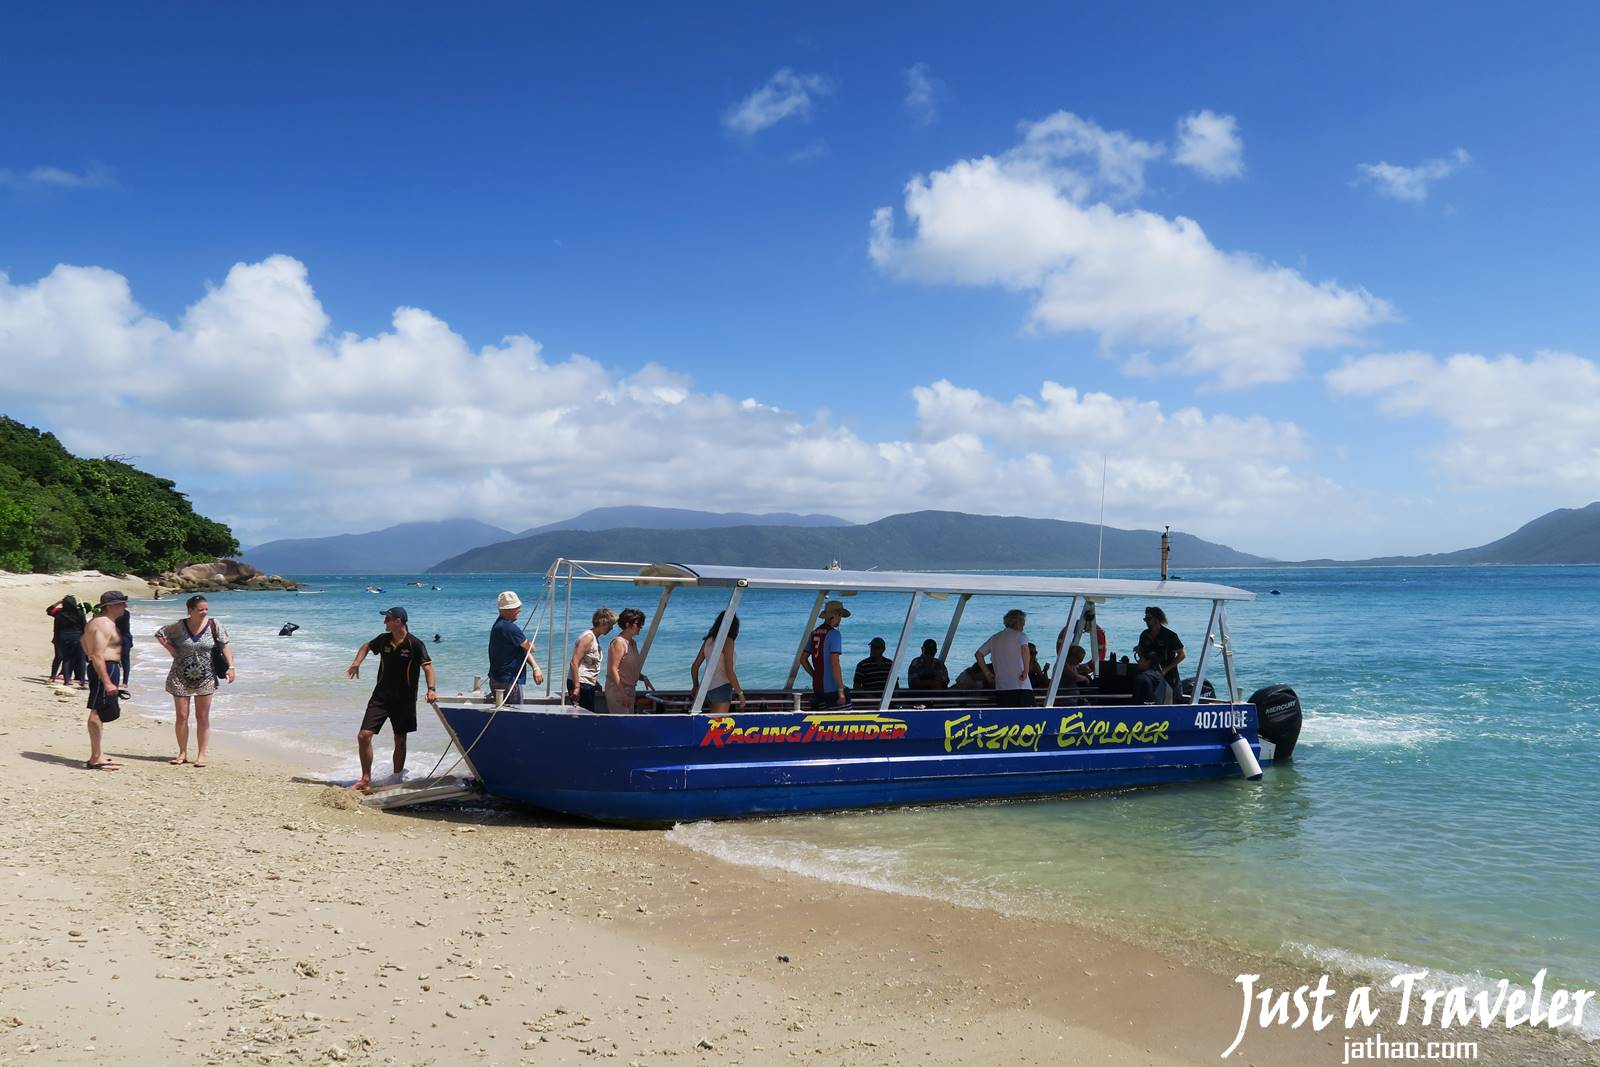 凱恩斯-大堡礁-綠島-翡翠島-內堡礁-交通-浮潛-潛水-景點-推薦-旅遊-自由行-澳洲-Carins-Great-Barrier-Reef-Green-Island-Fitzroy-Island-Snorkel-Diving-Travel-Australia